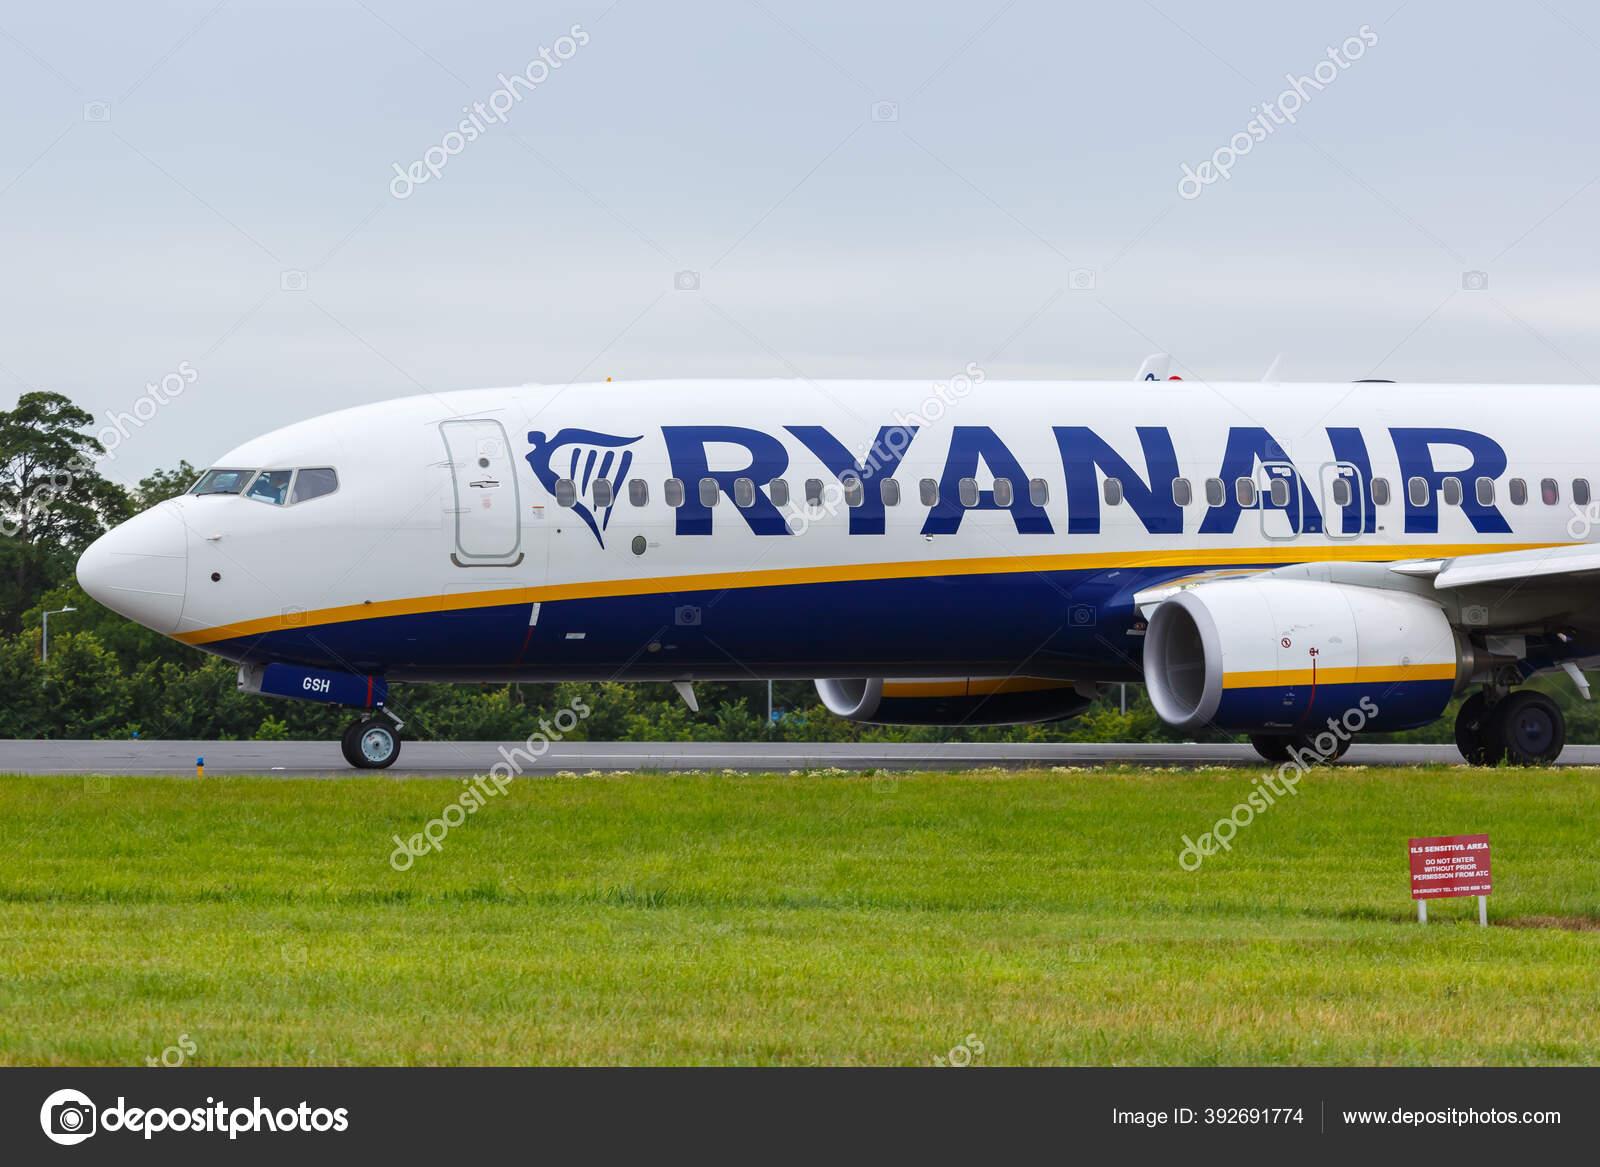 Обои ночь, Boeing 737, Самолёт, b737, tuifly, aircraft. Авиация foto 10